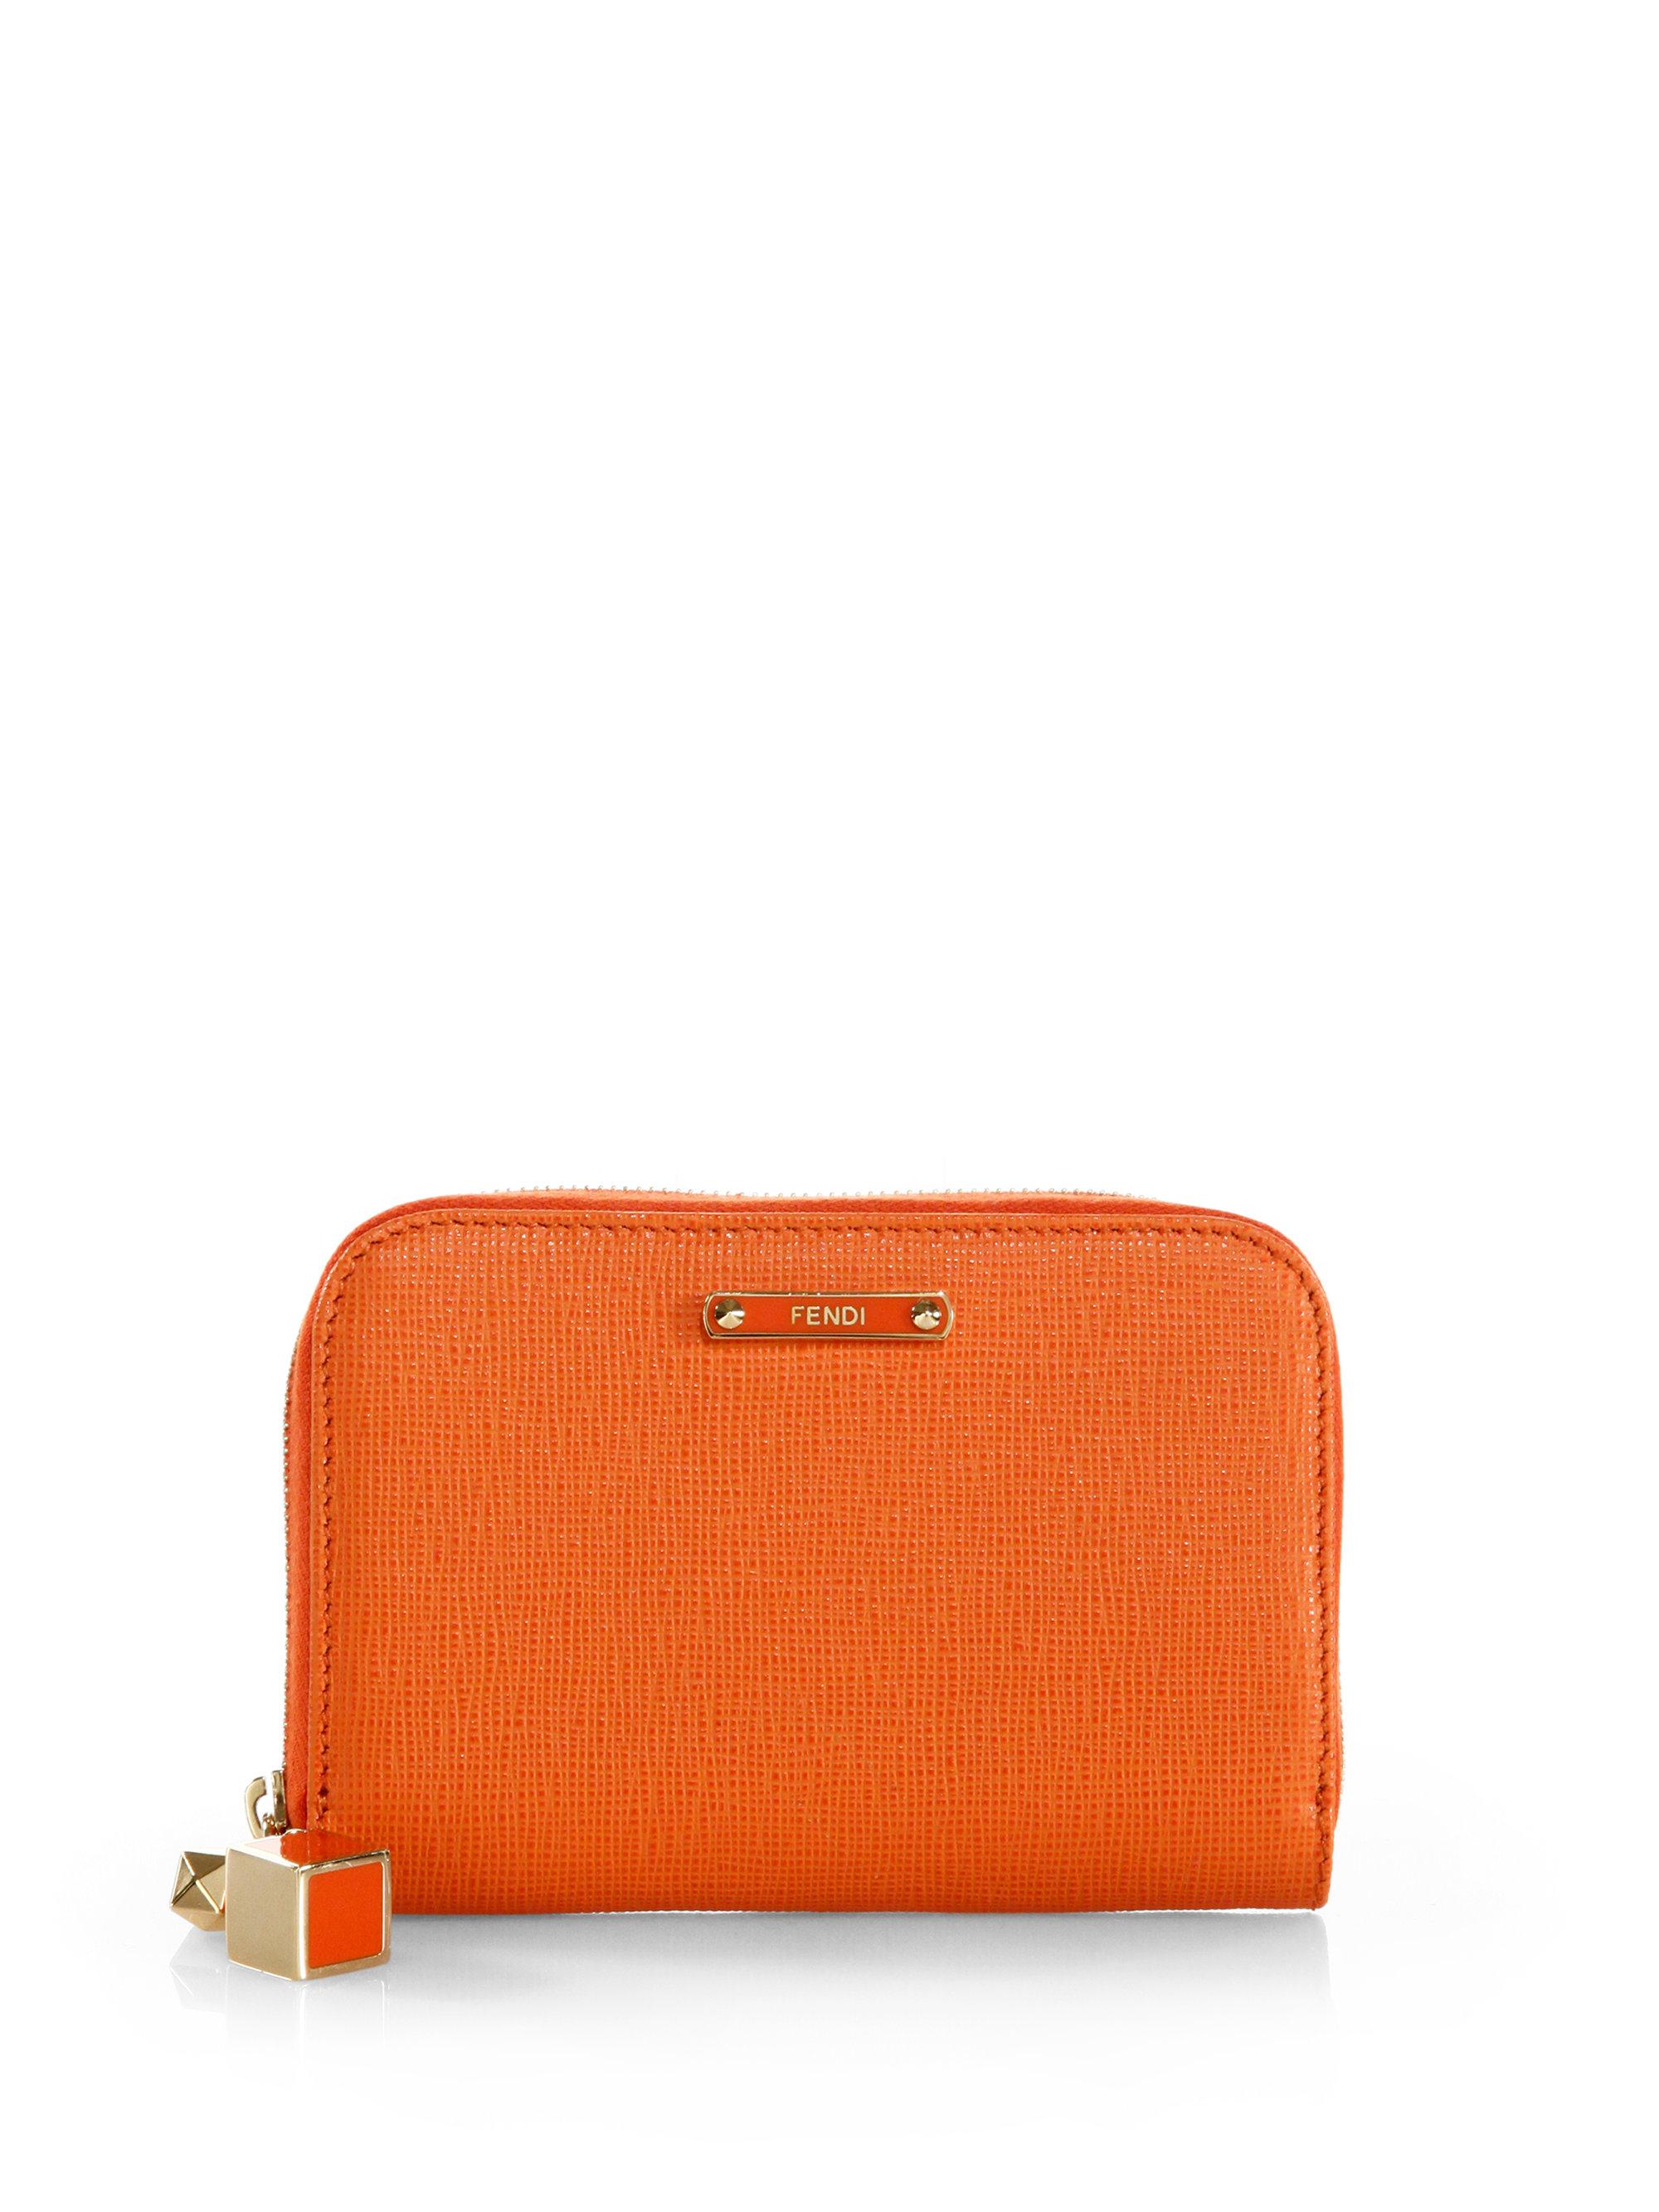 Fendi Orange Card Holder